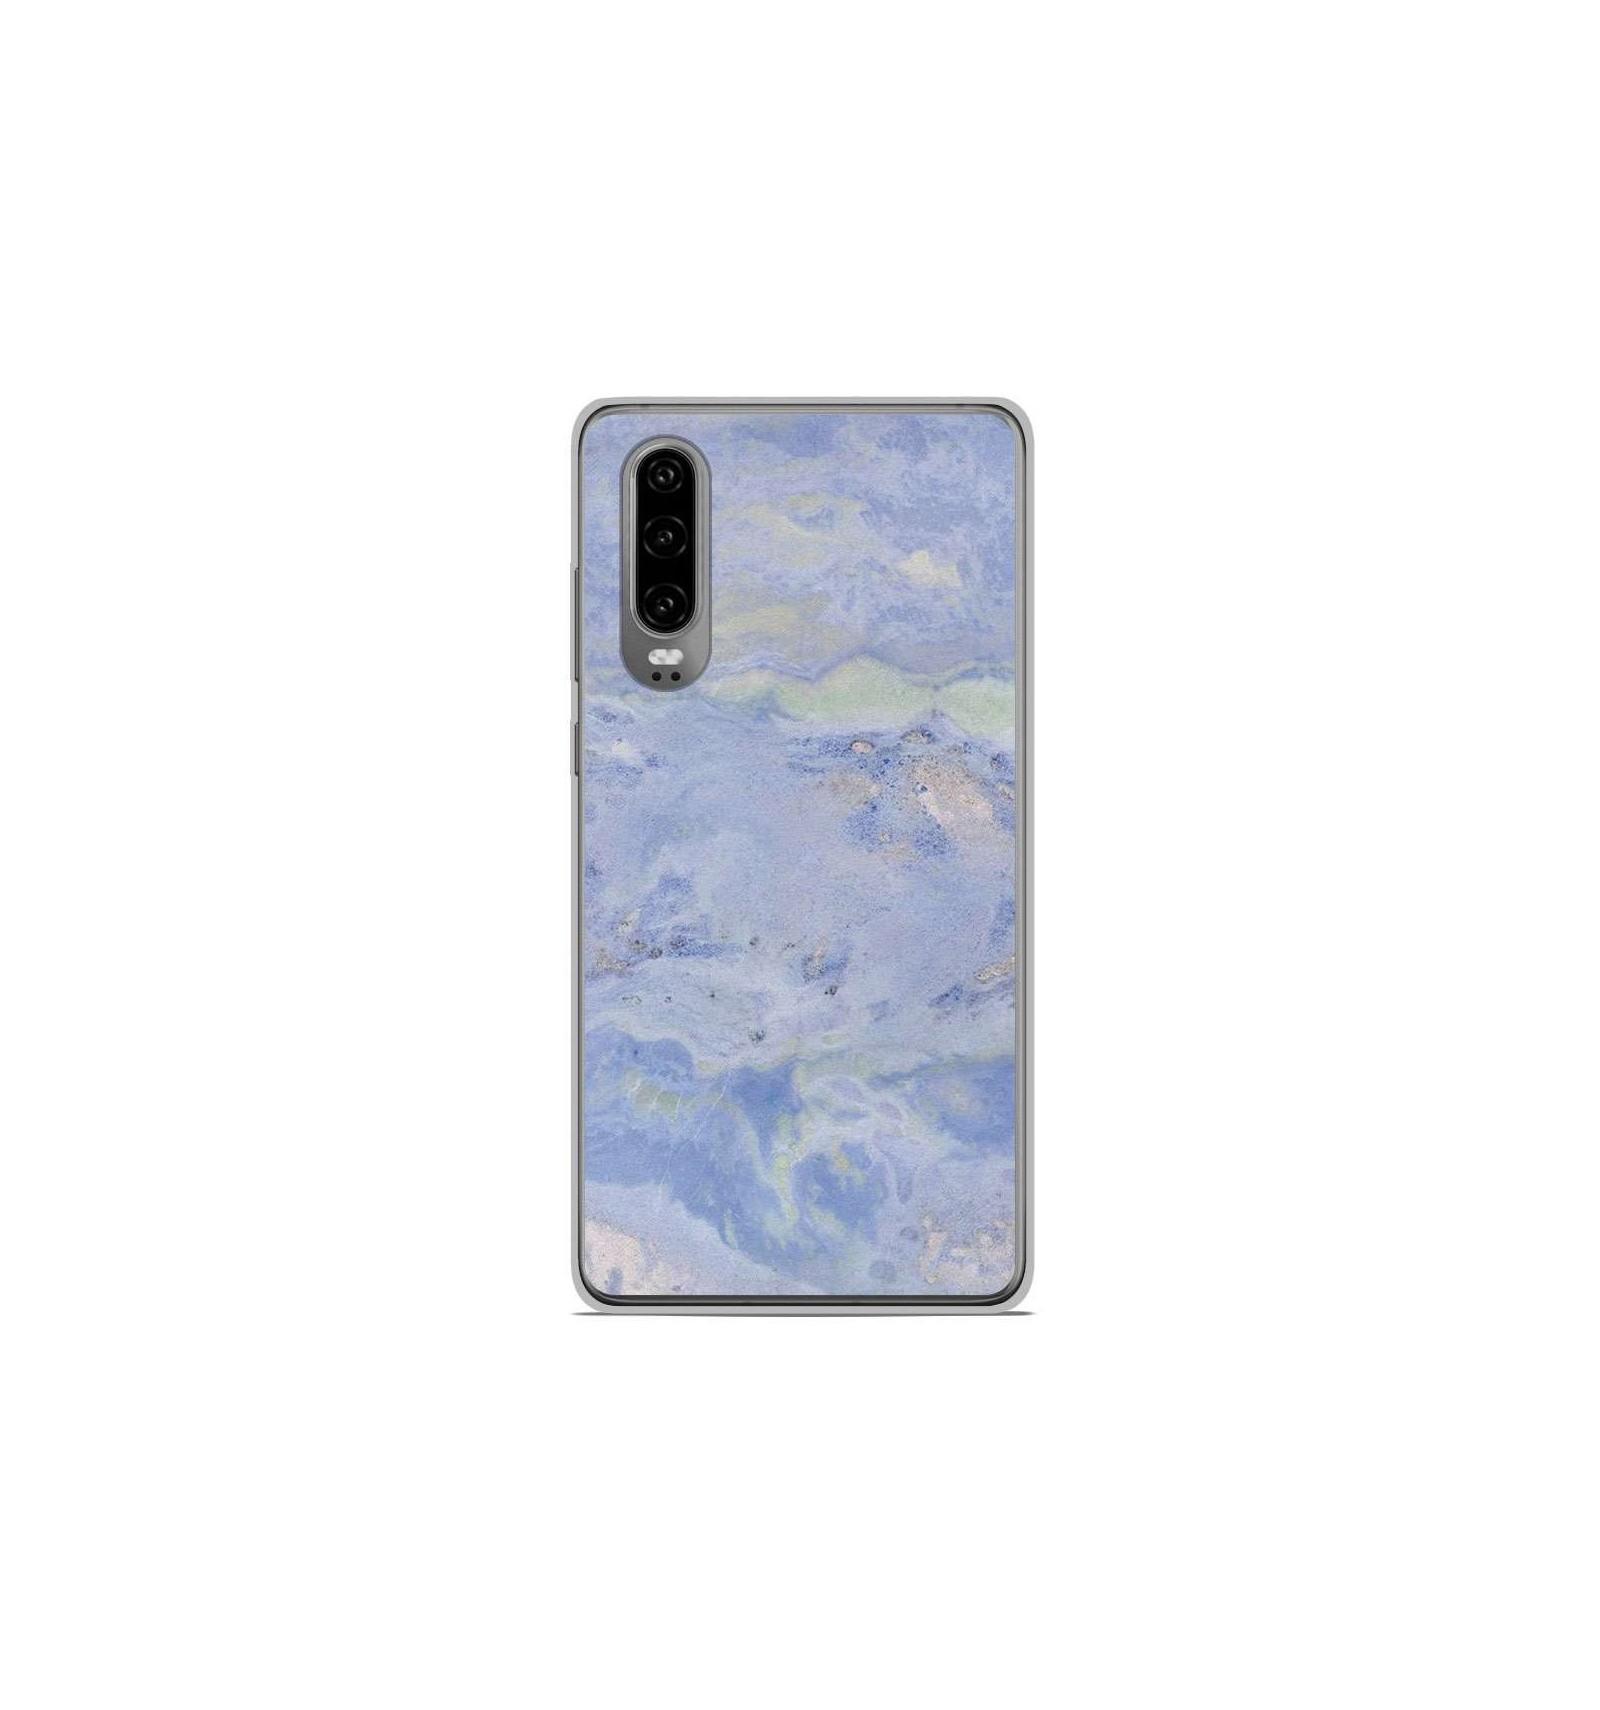 coque p30 huawei marbre